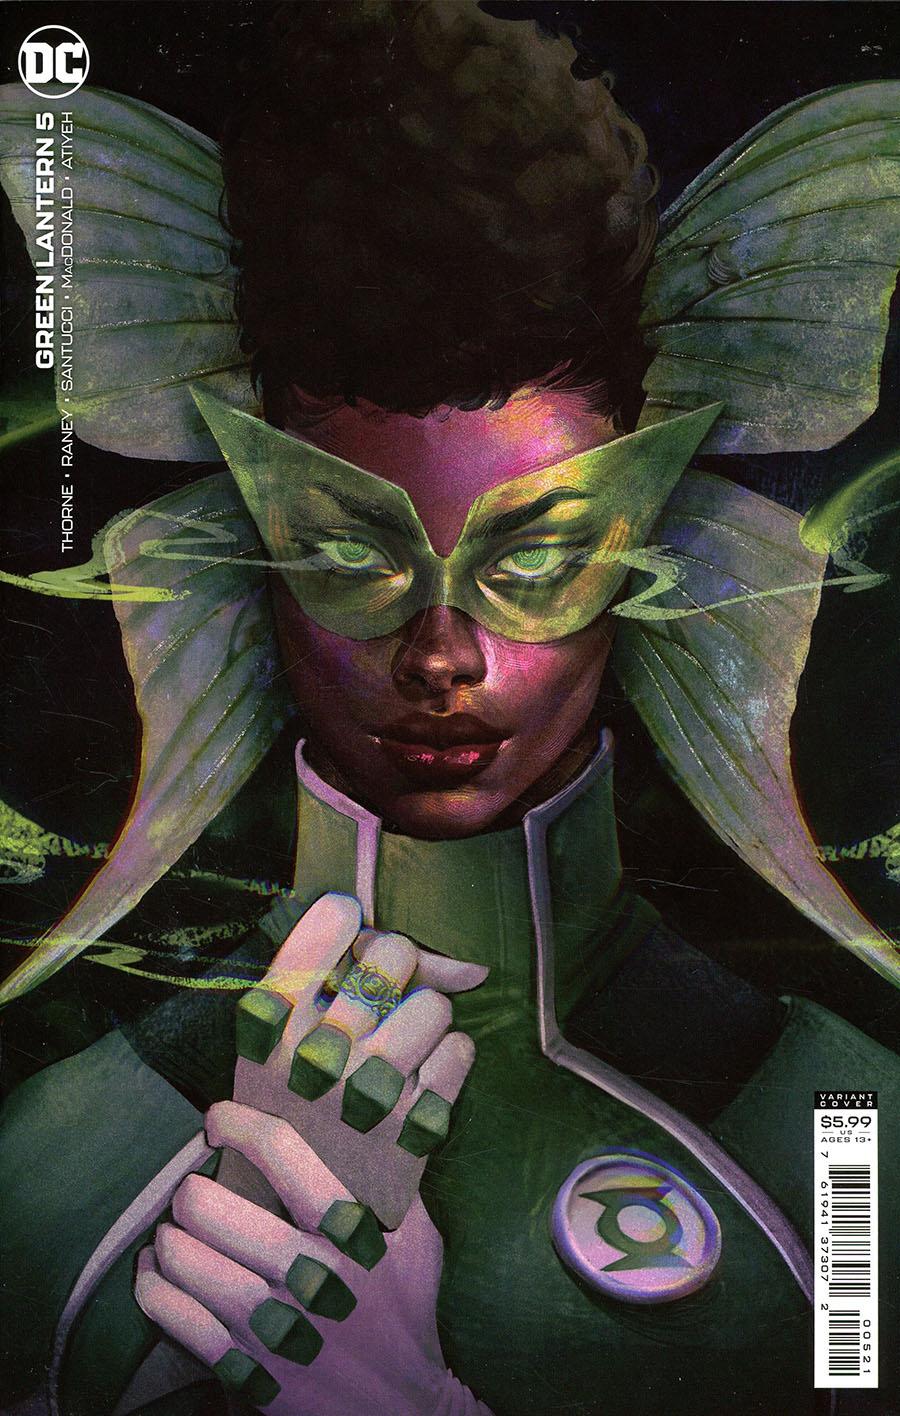 Green Lantern Vol 7 #5 Cover B Variant Juliet Nneka Card Stock Cover